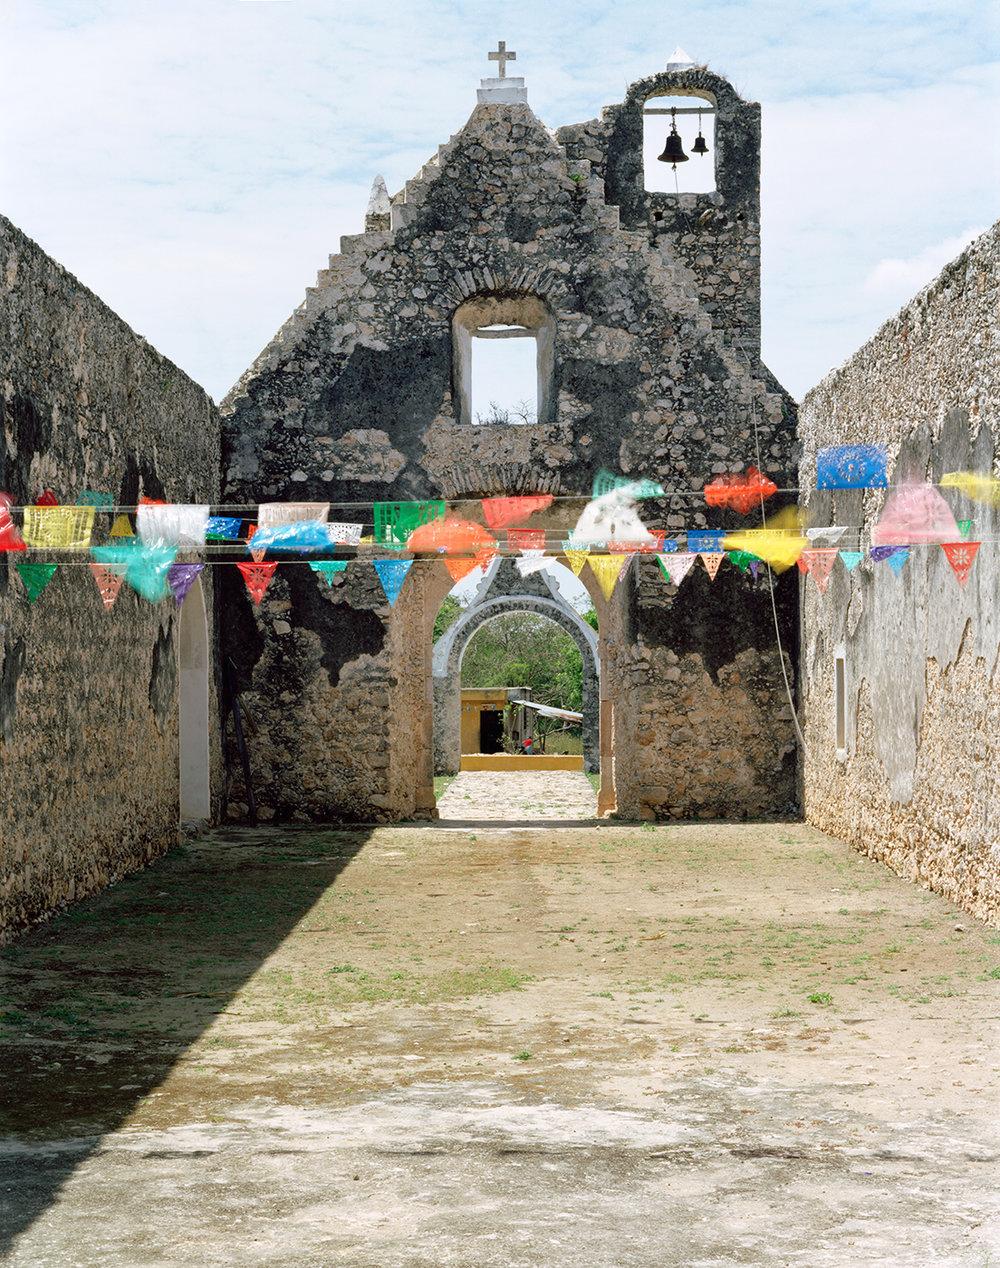 Mission church at Pixila, Mexico - 2010   Ruination